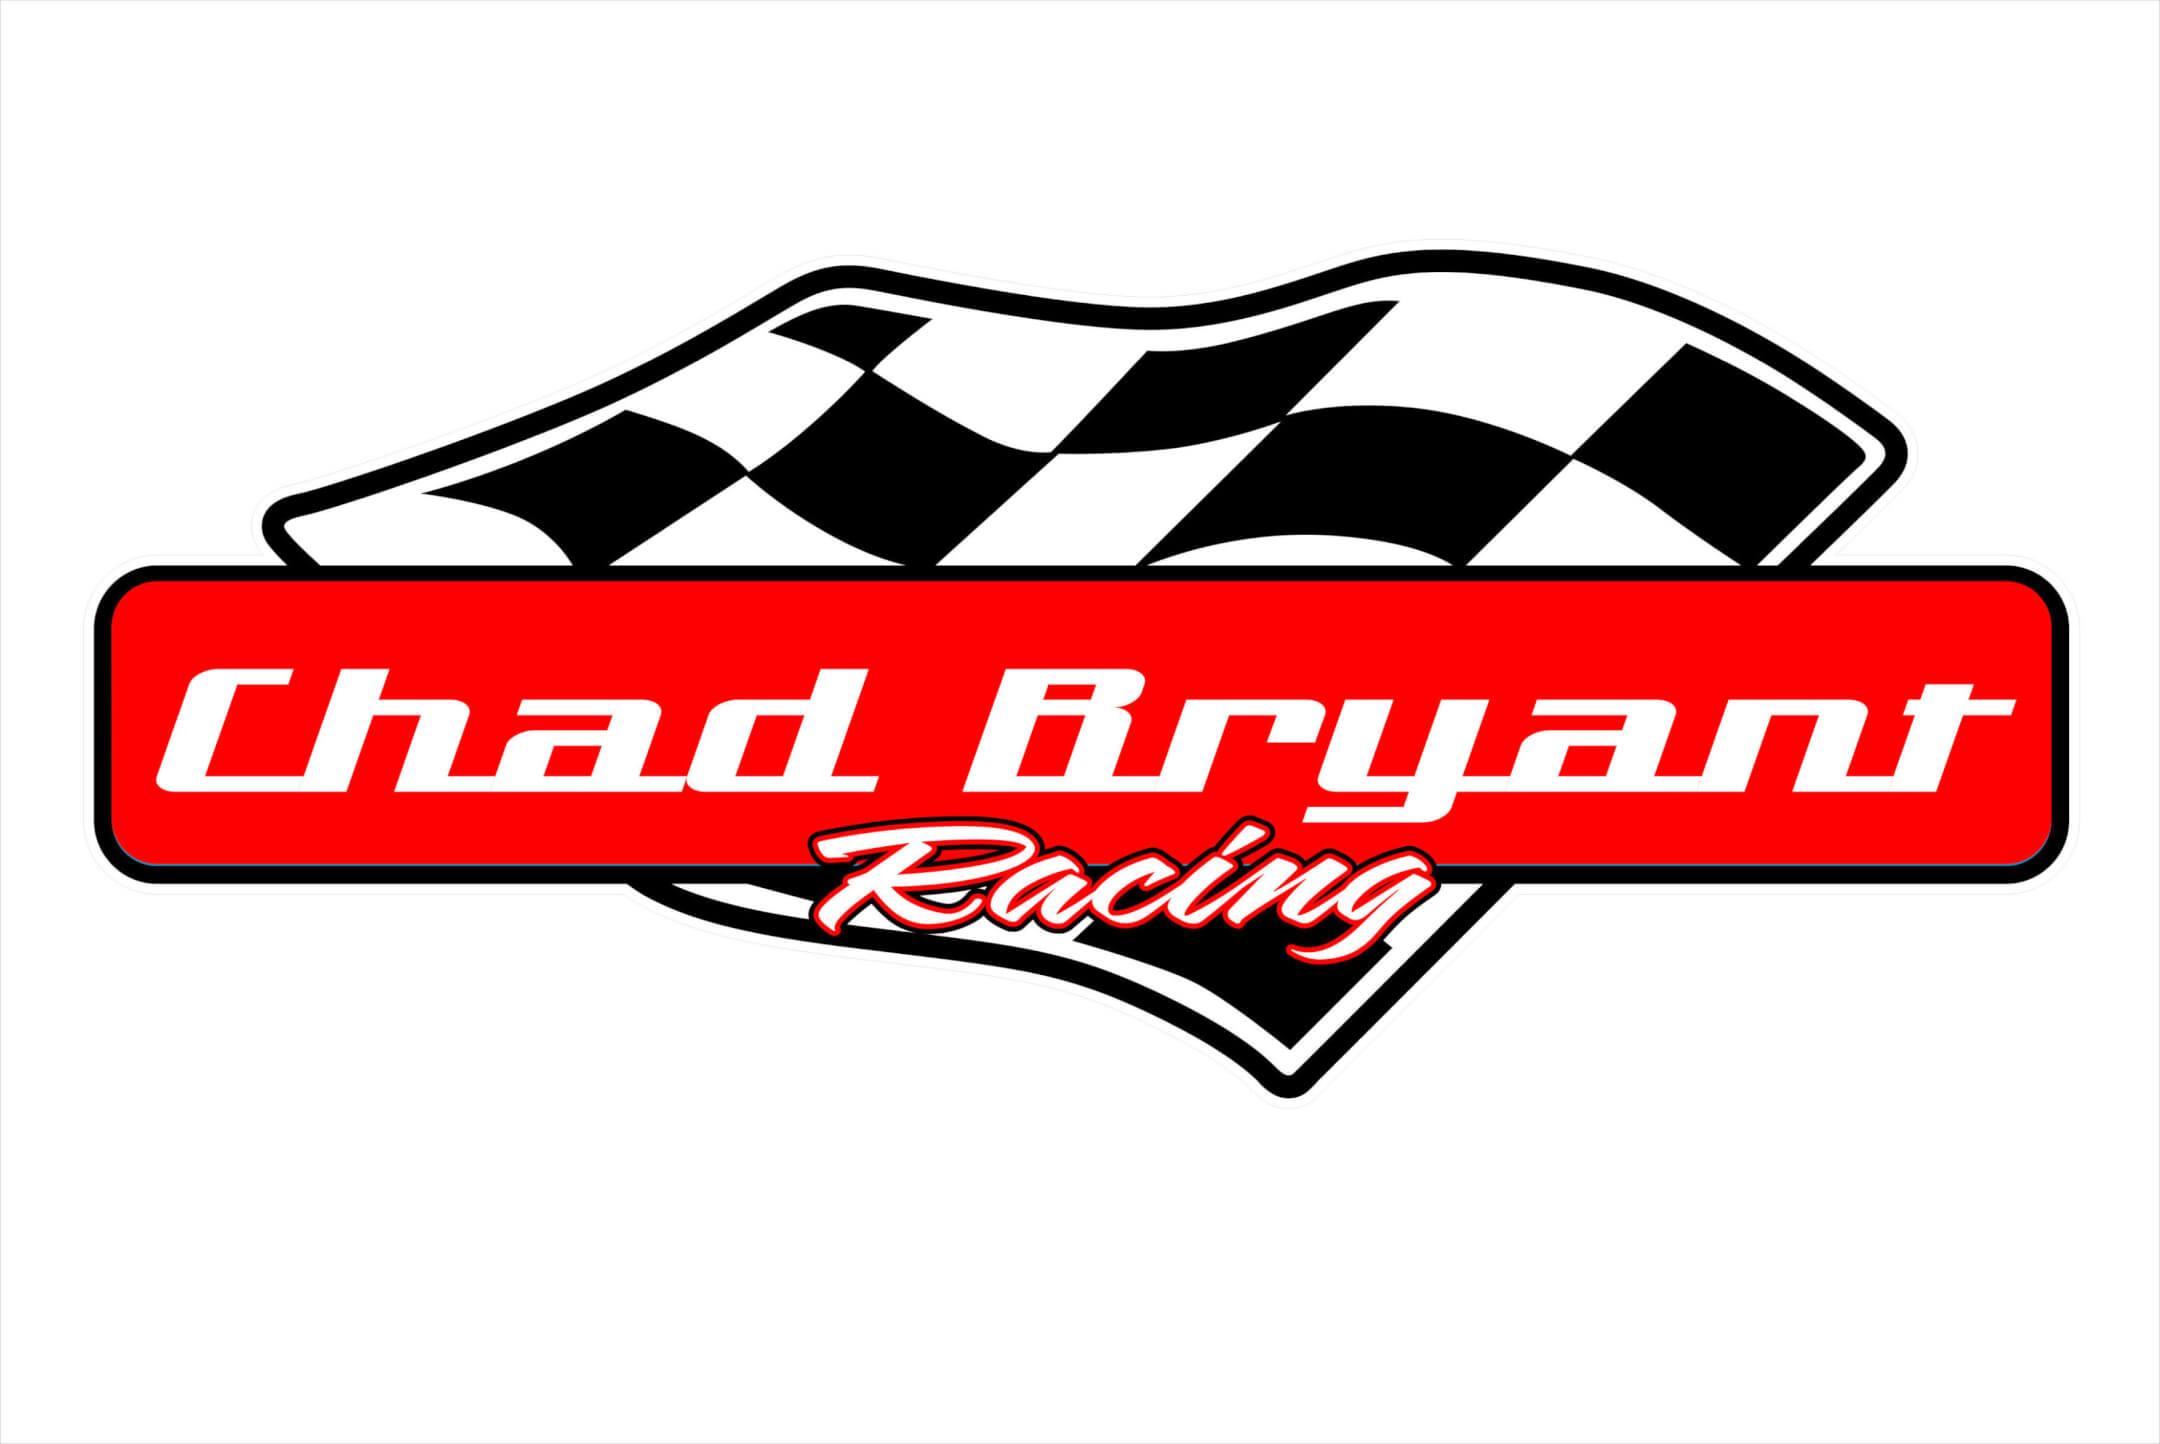 2160x1444 Josh Berry To Drive No. 22 Big Tine Car In Salem Arca Race